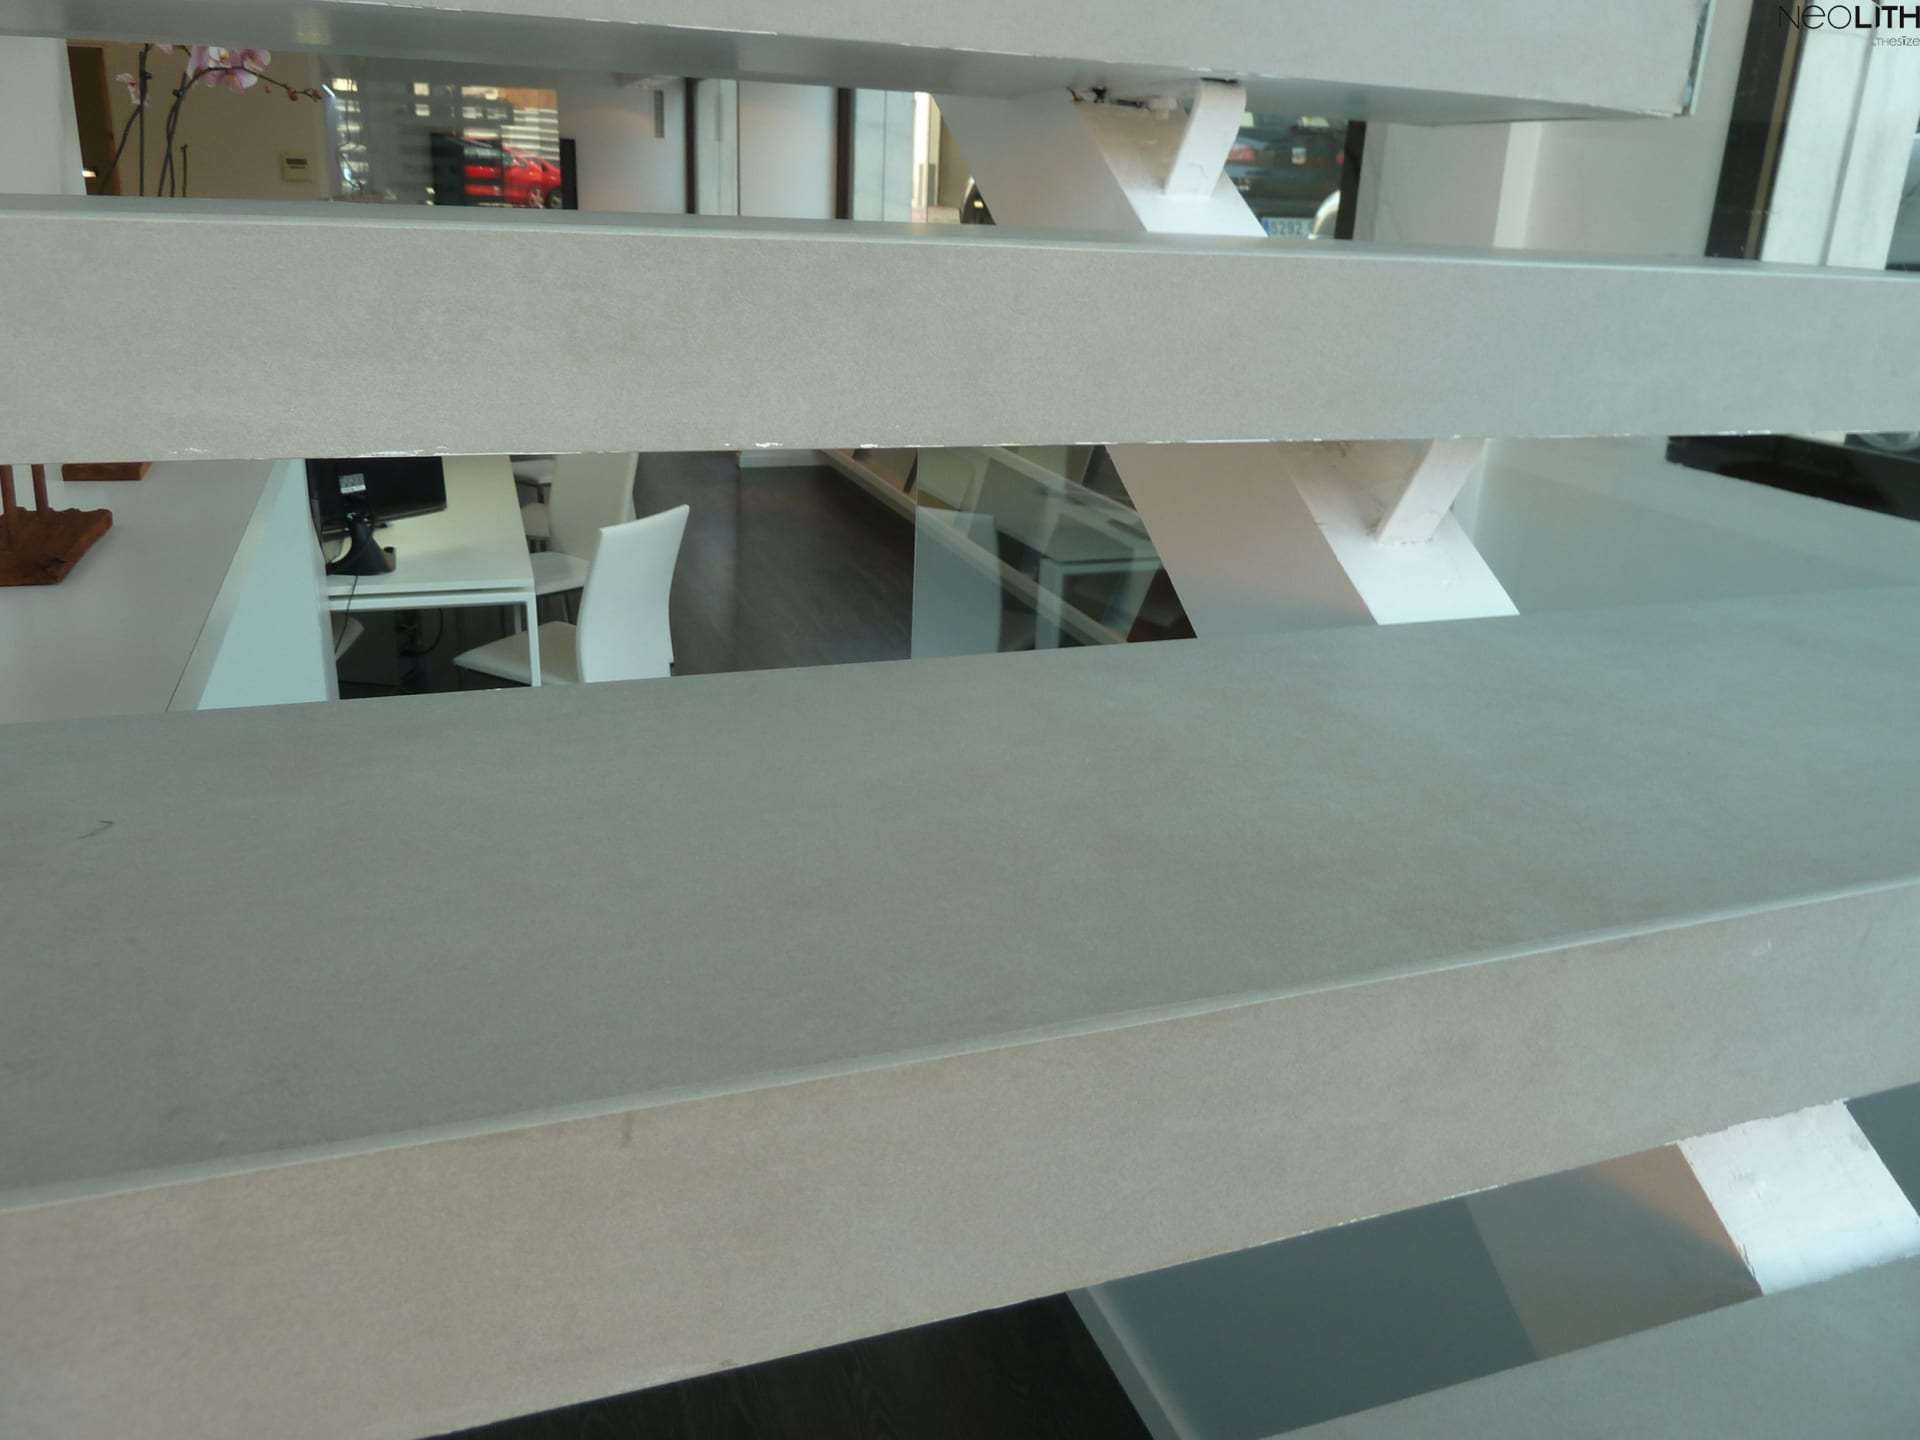 Neolith Phedra vloer